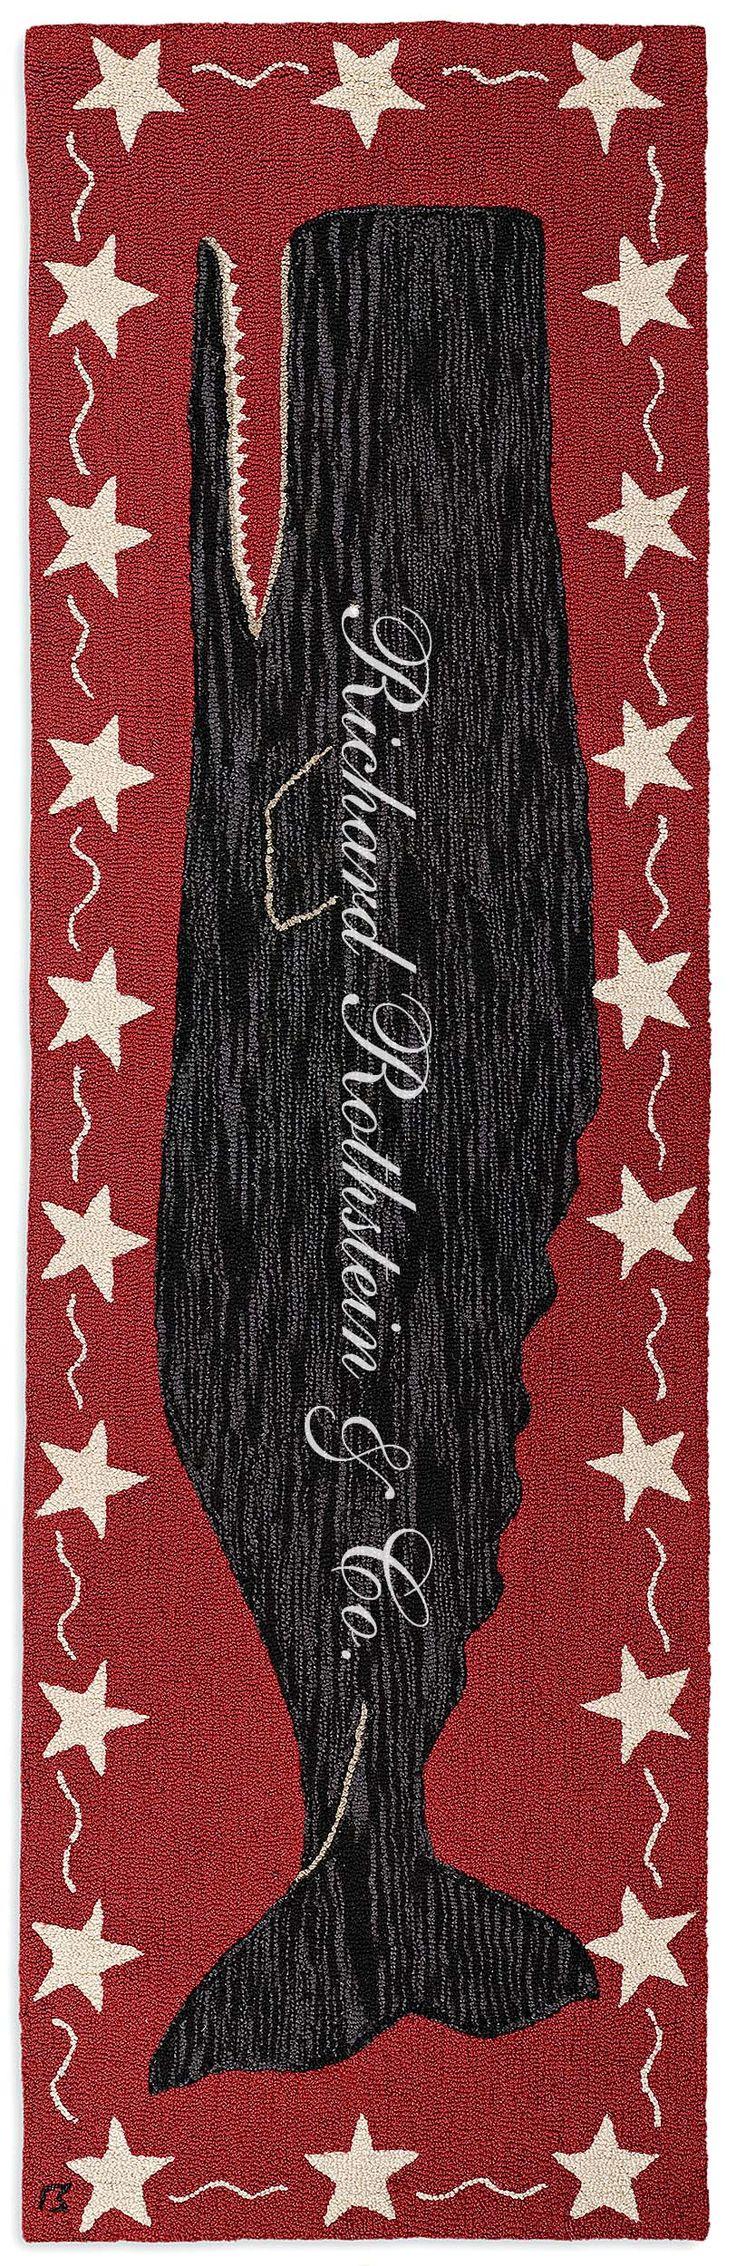 Nautical rugs for bathroom -  Bathroom Black Whale Nautical Rug Download